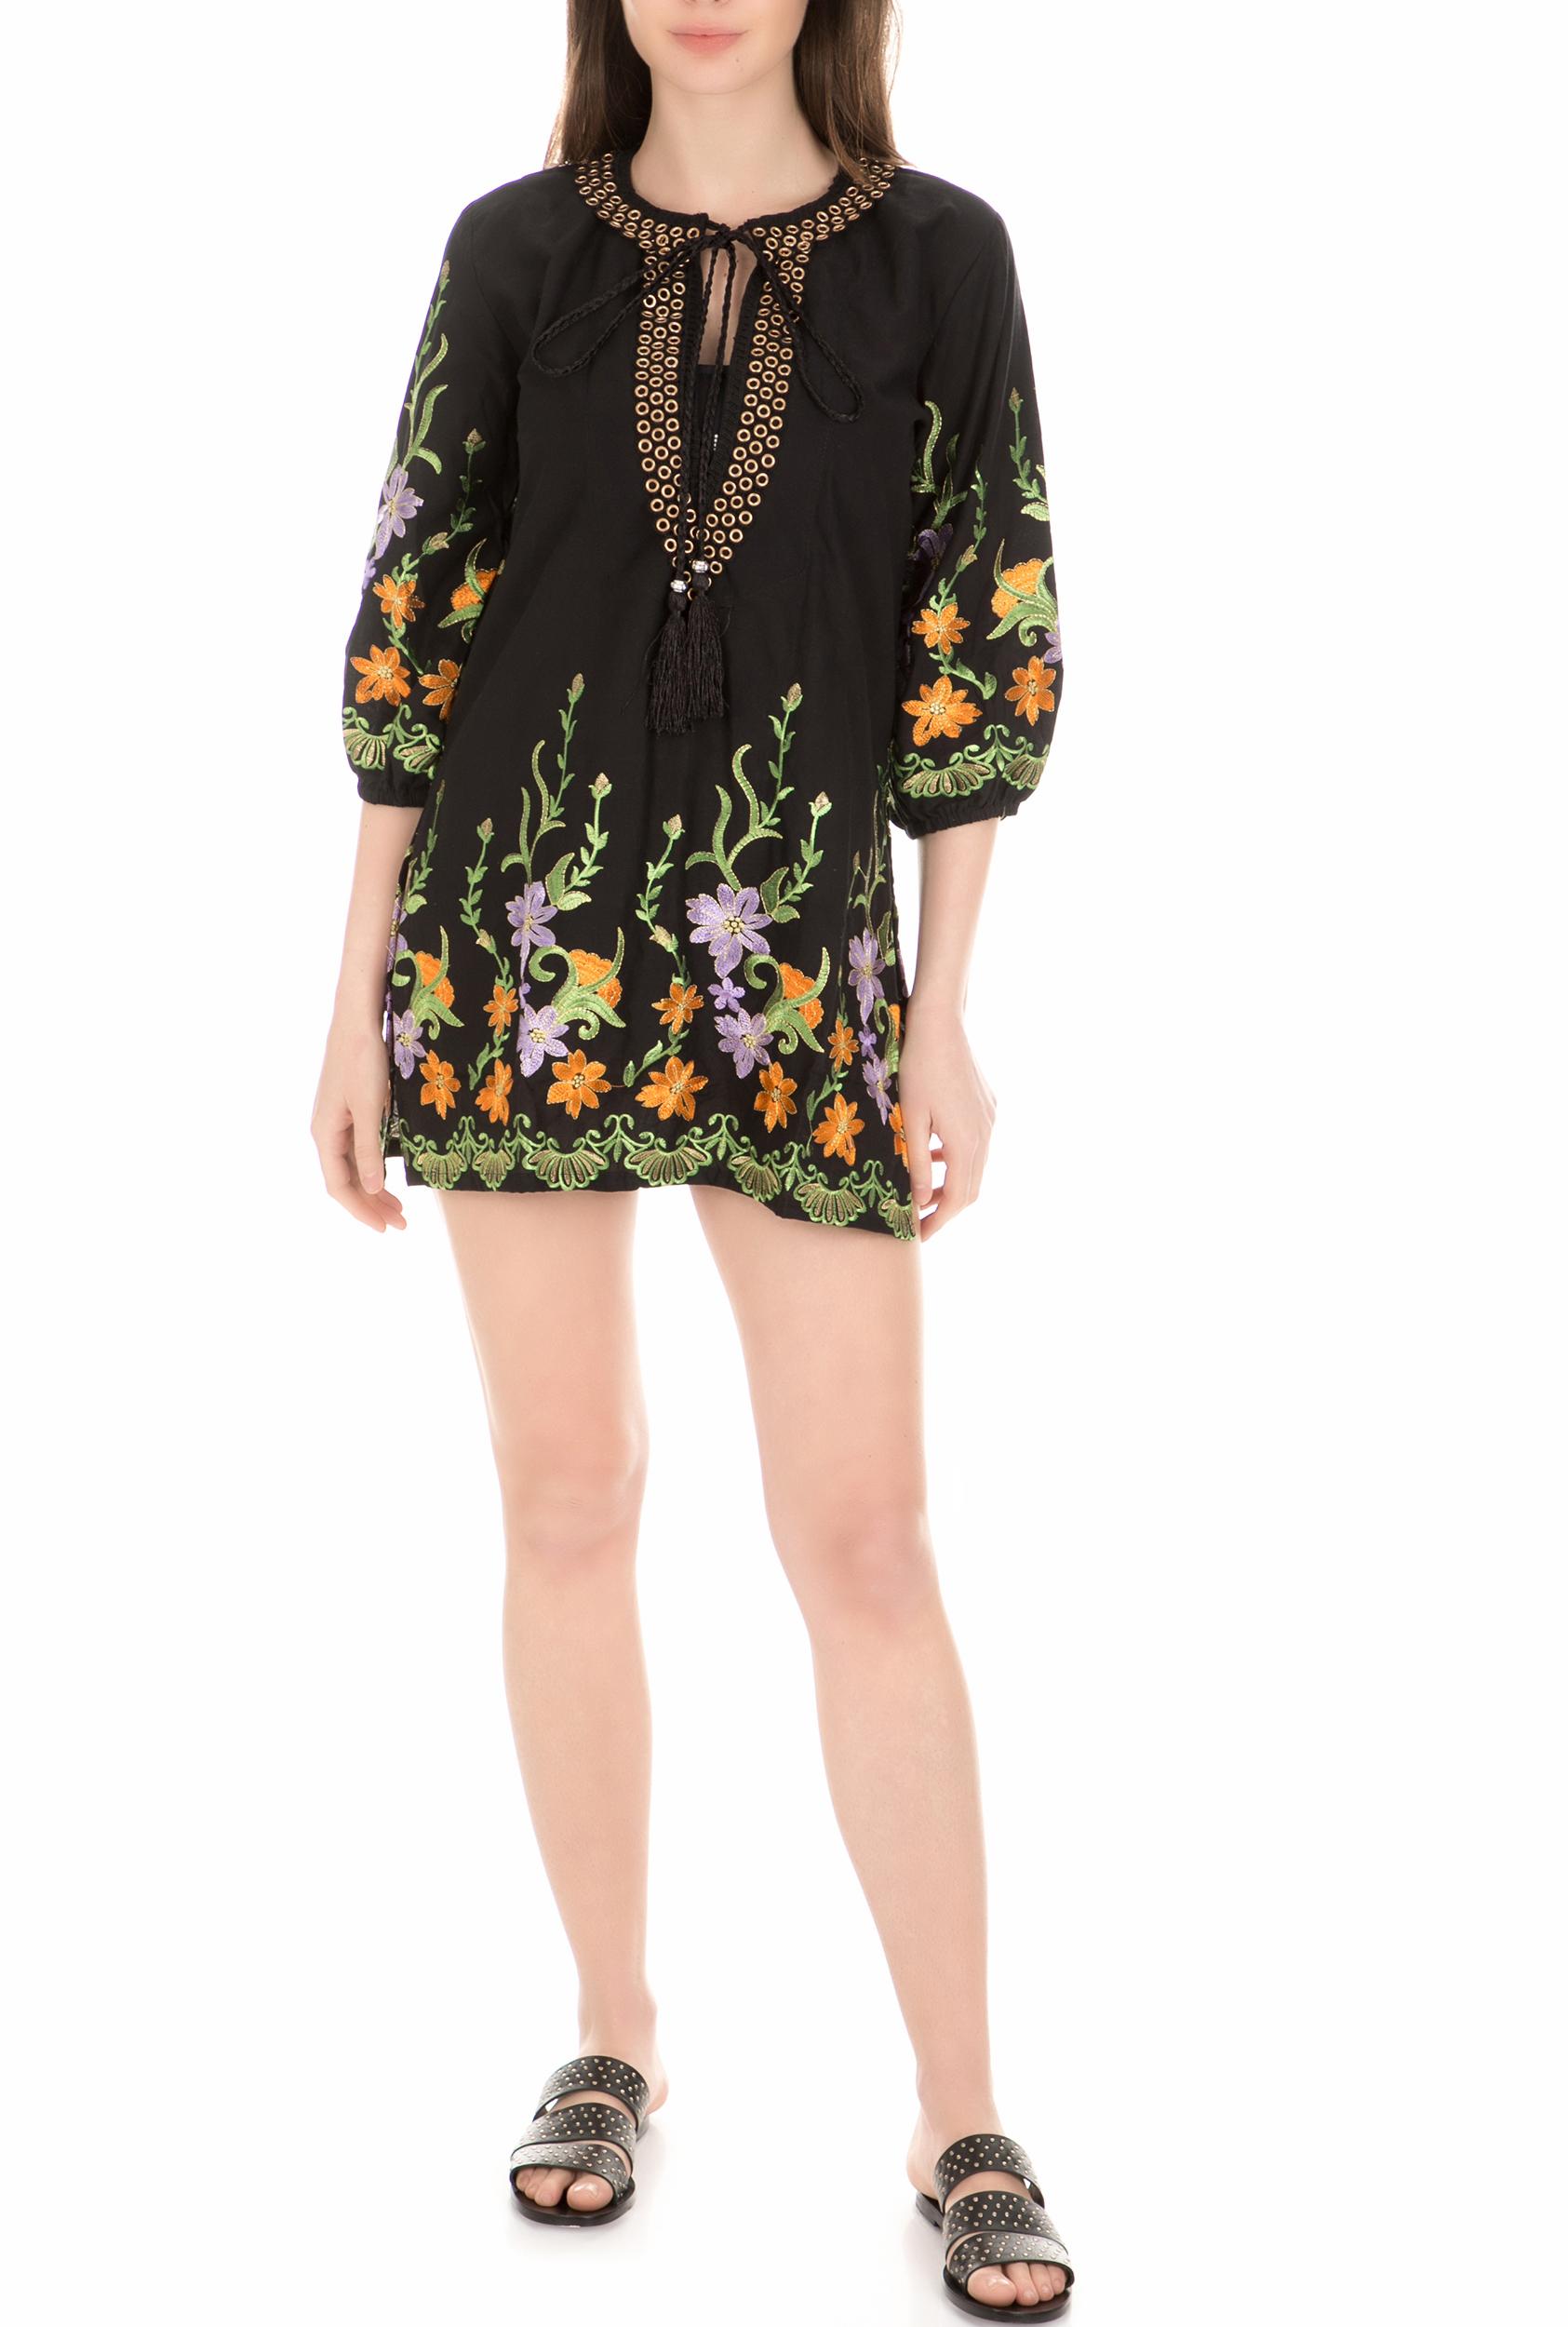 GOOSHWA - Γυναικείο φόρεμα παραλίας GOOSHWA μαύρο γυναικεία ρούχα φόρεματα μίνι